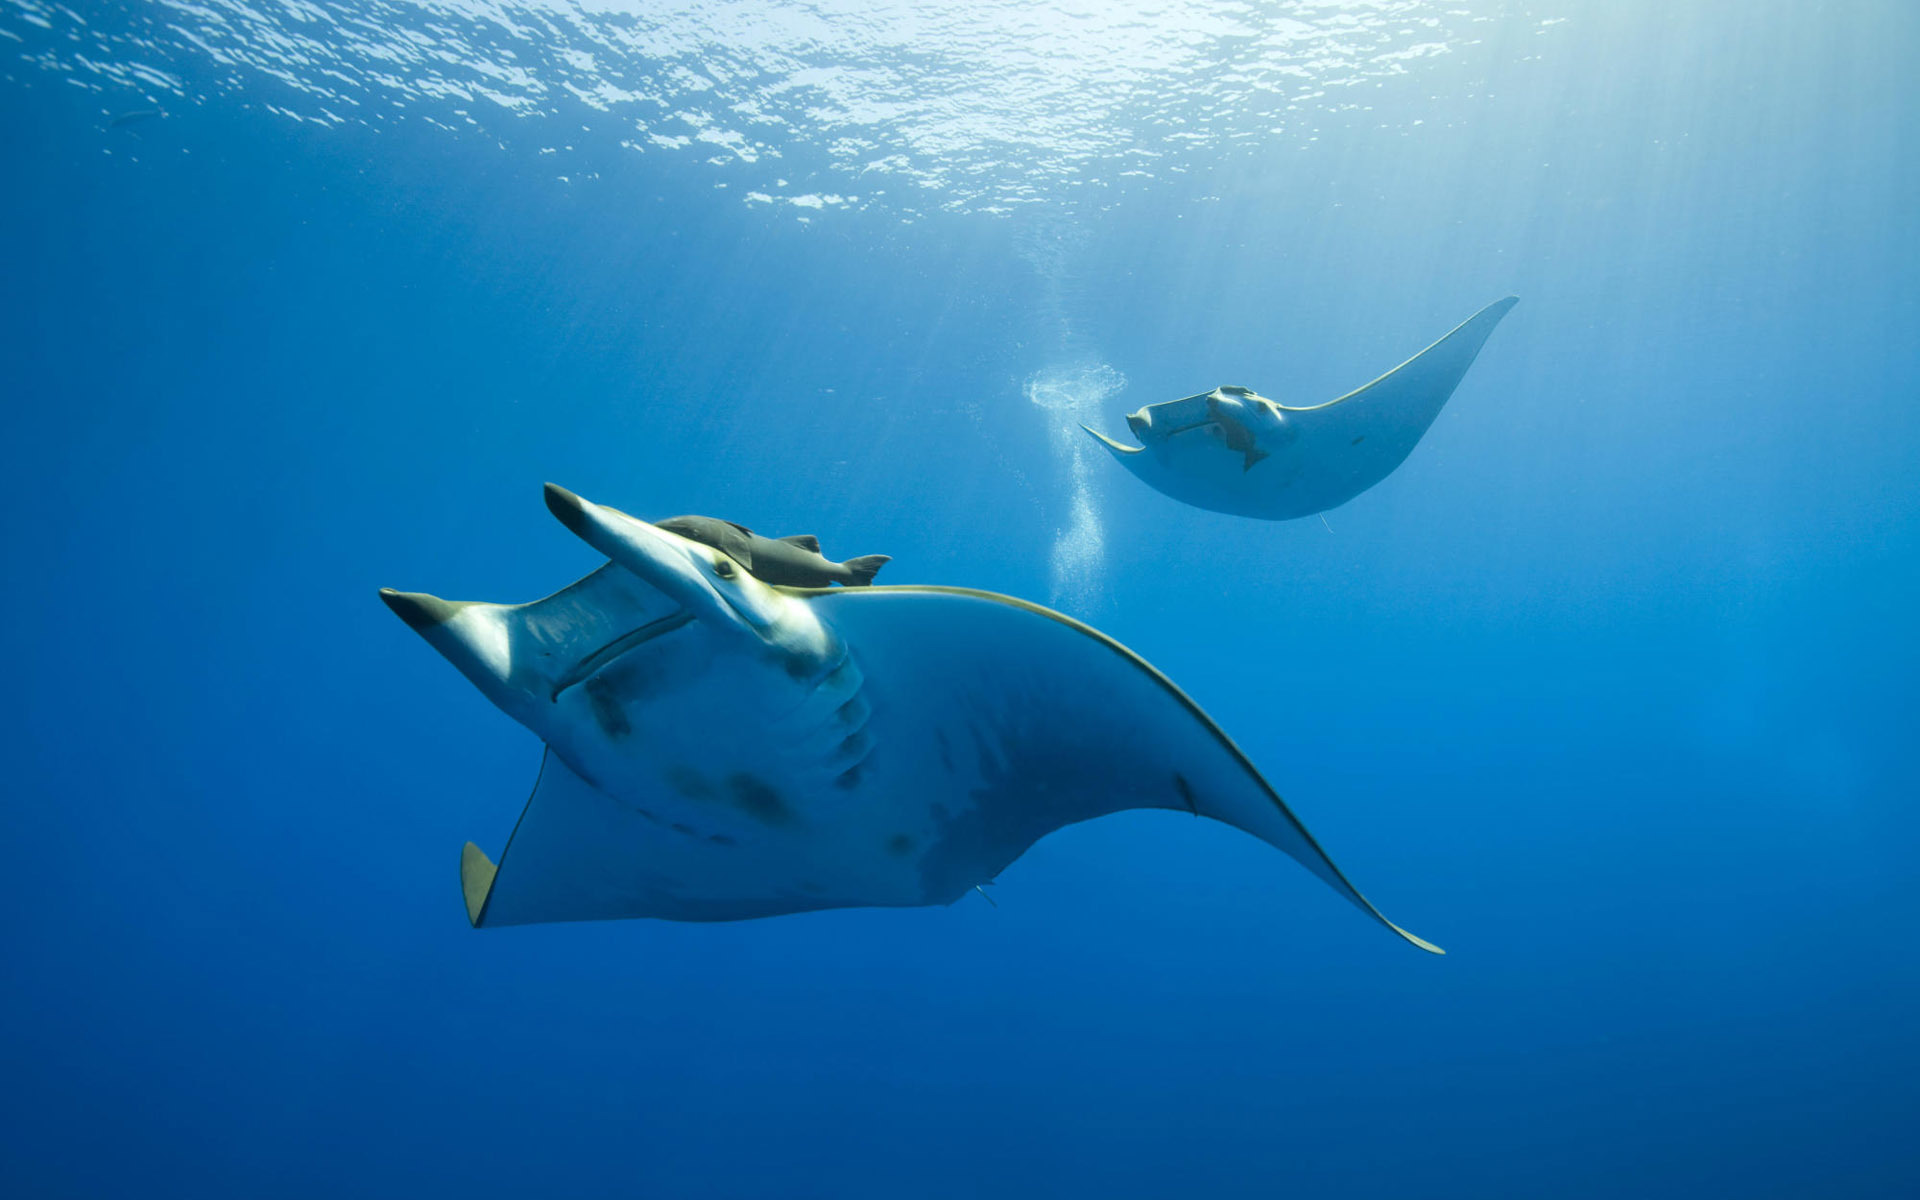 Картинка: Скат манта, два, плывут, вода, океан, море, свет, пузырьки